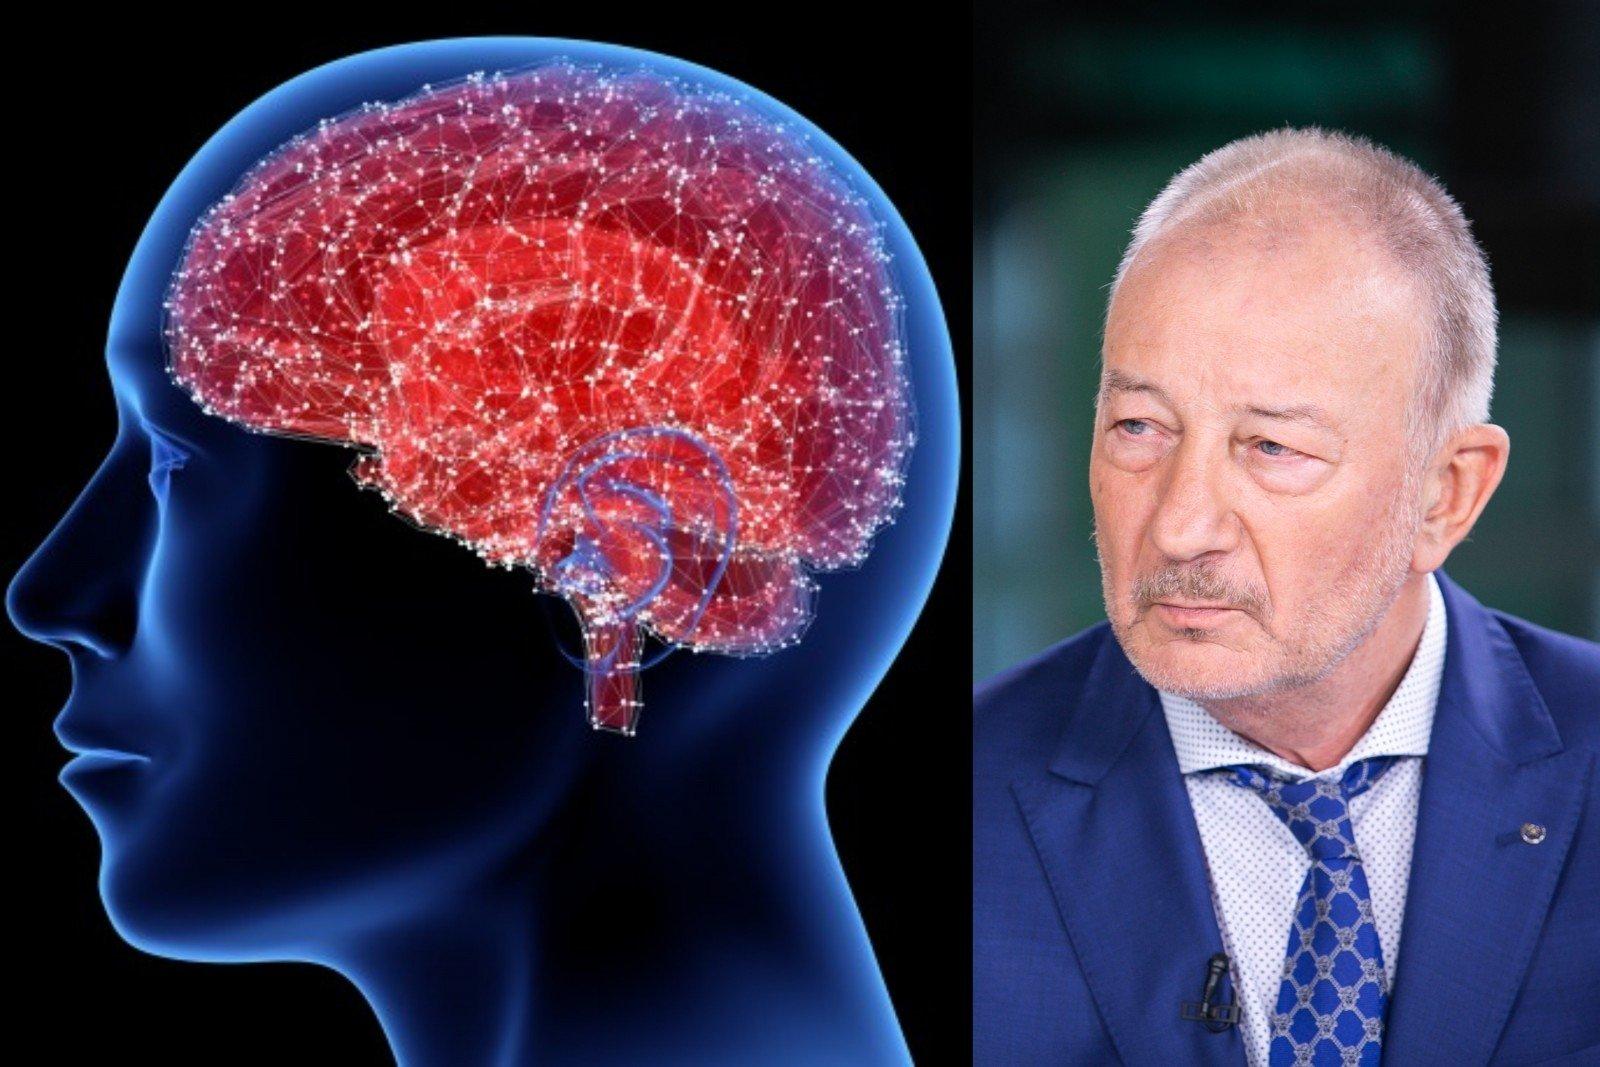 smegenys su hipertenzija)